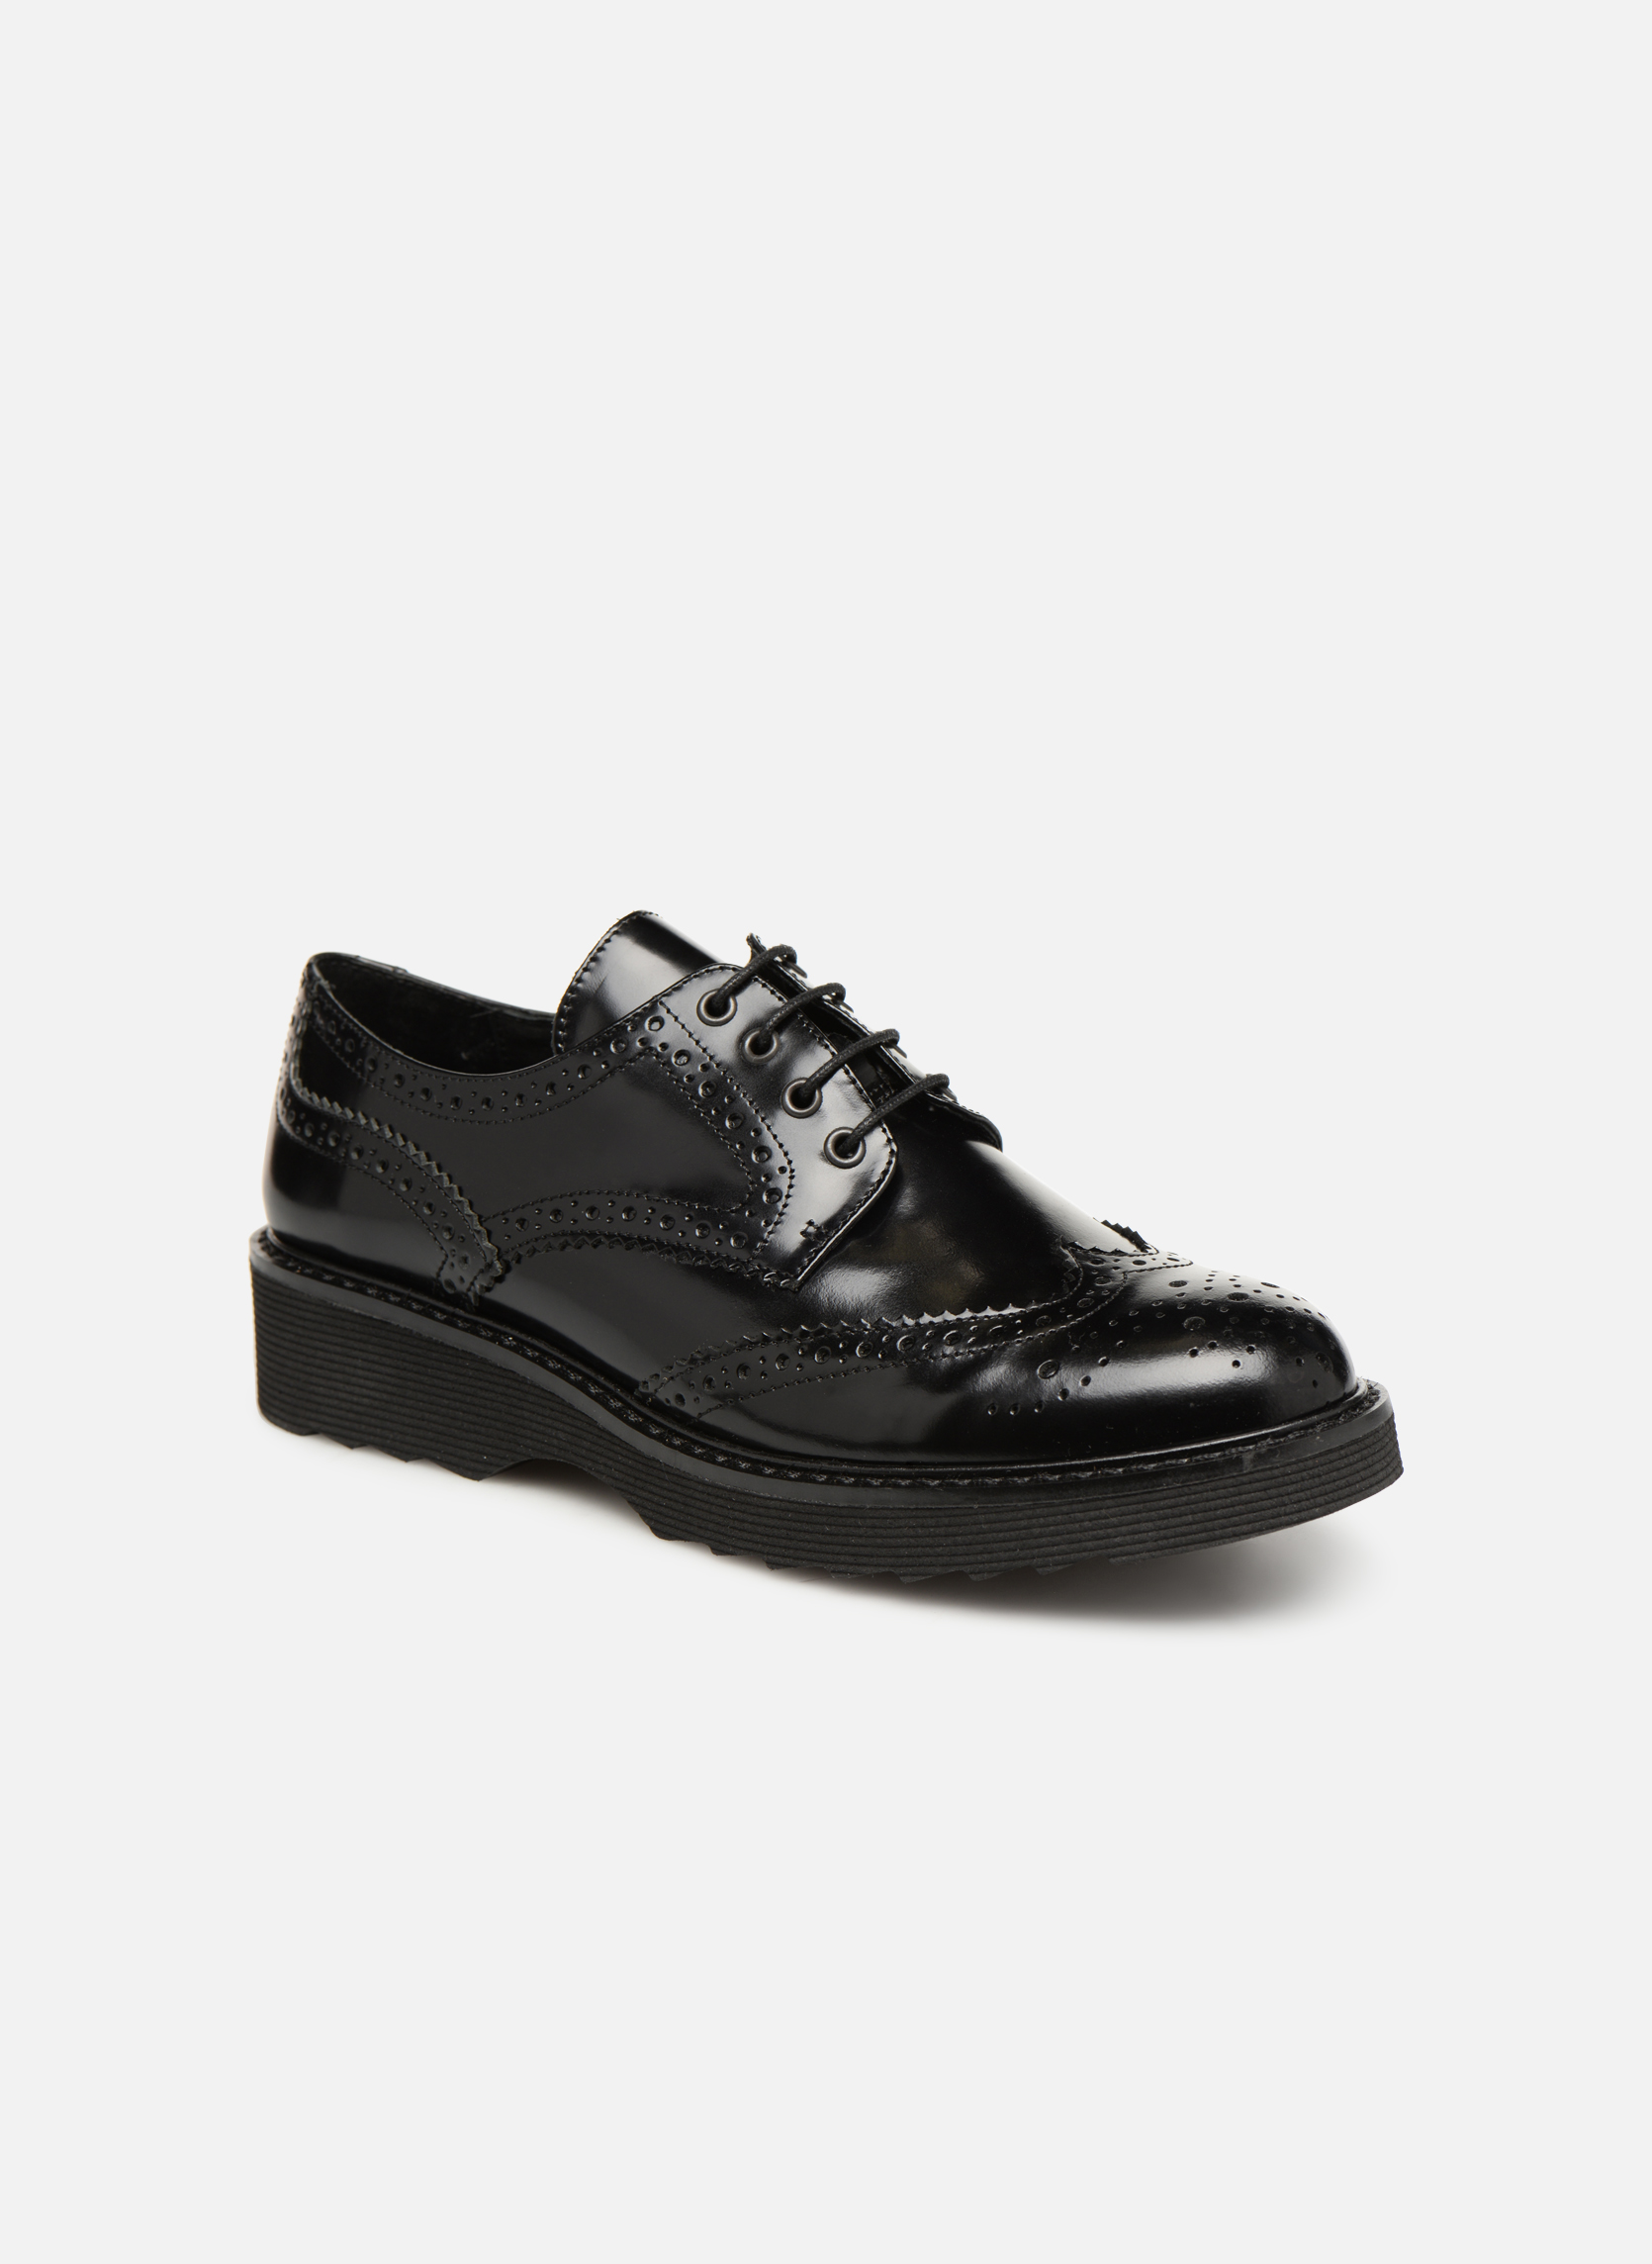 e69ebe213006b0 Schuhe Sarenza aus der Werbung